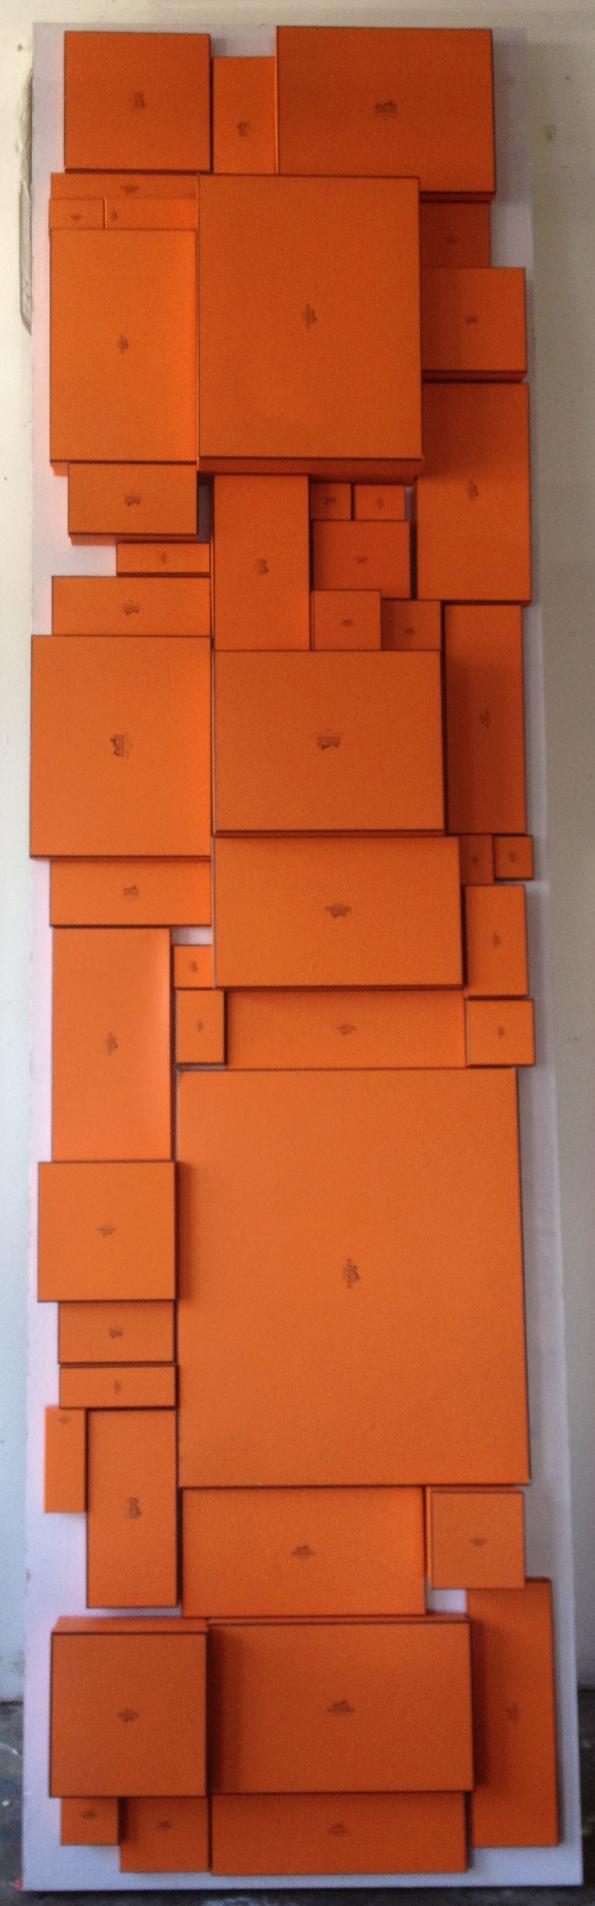 hermes box 3m x 1m